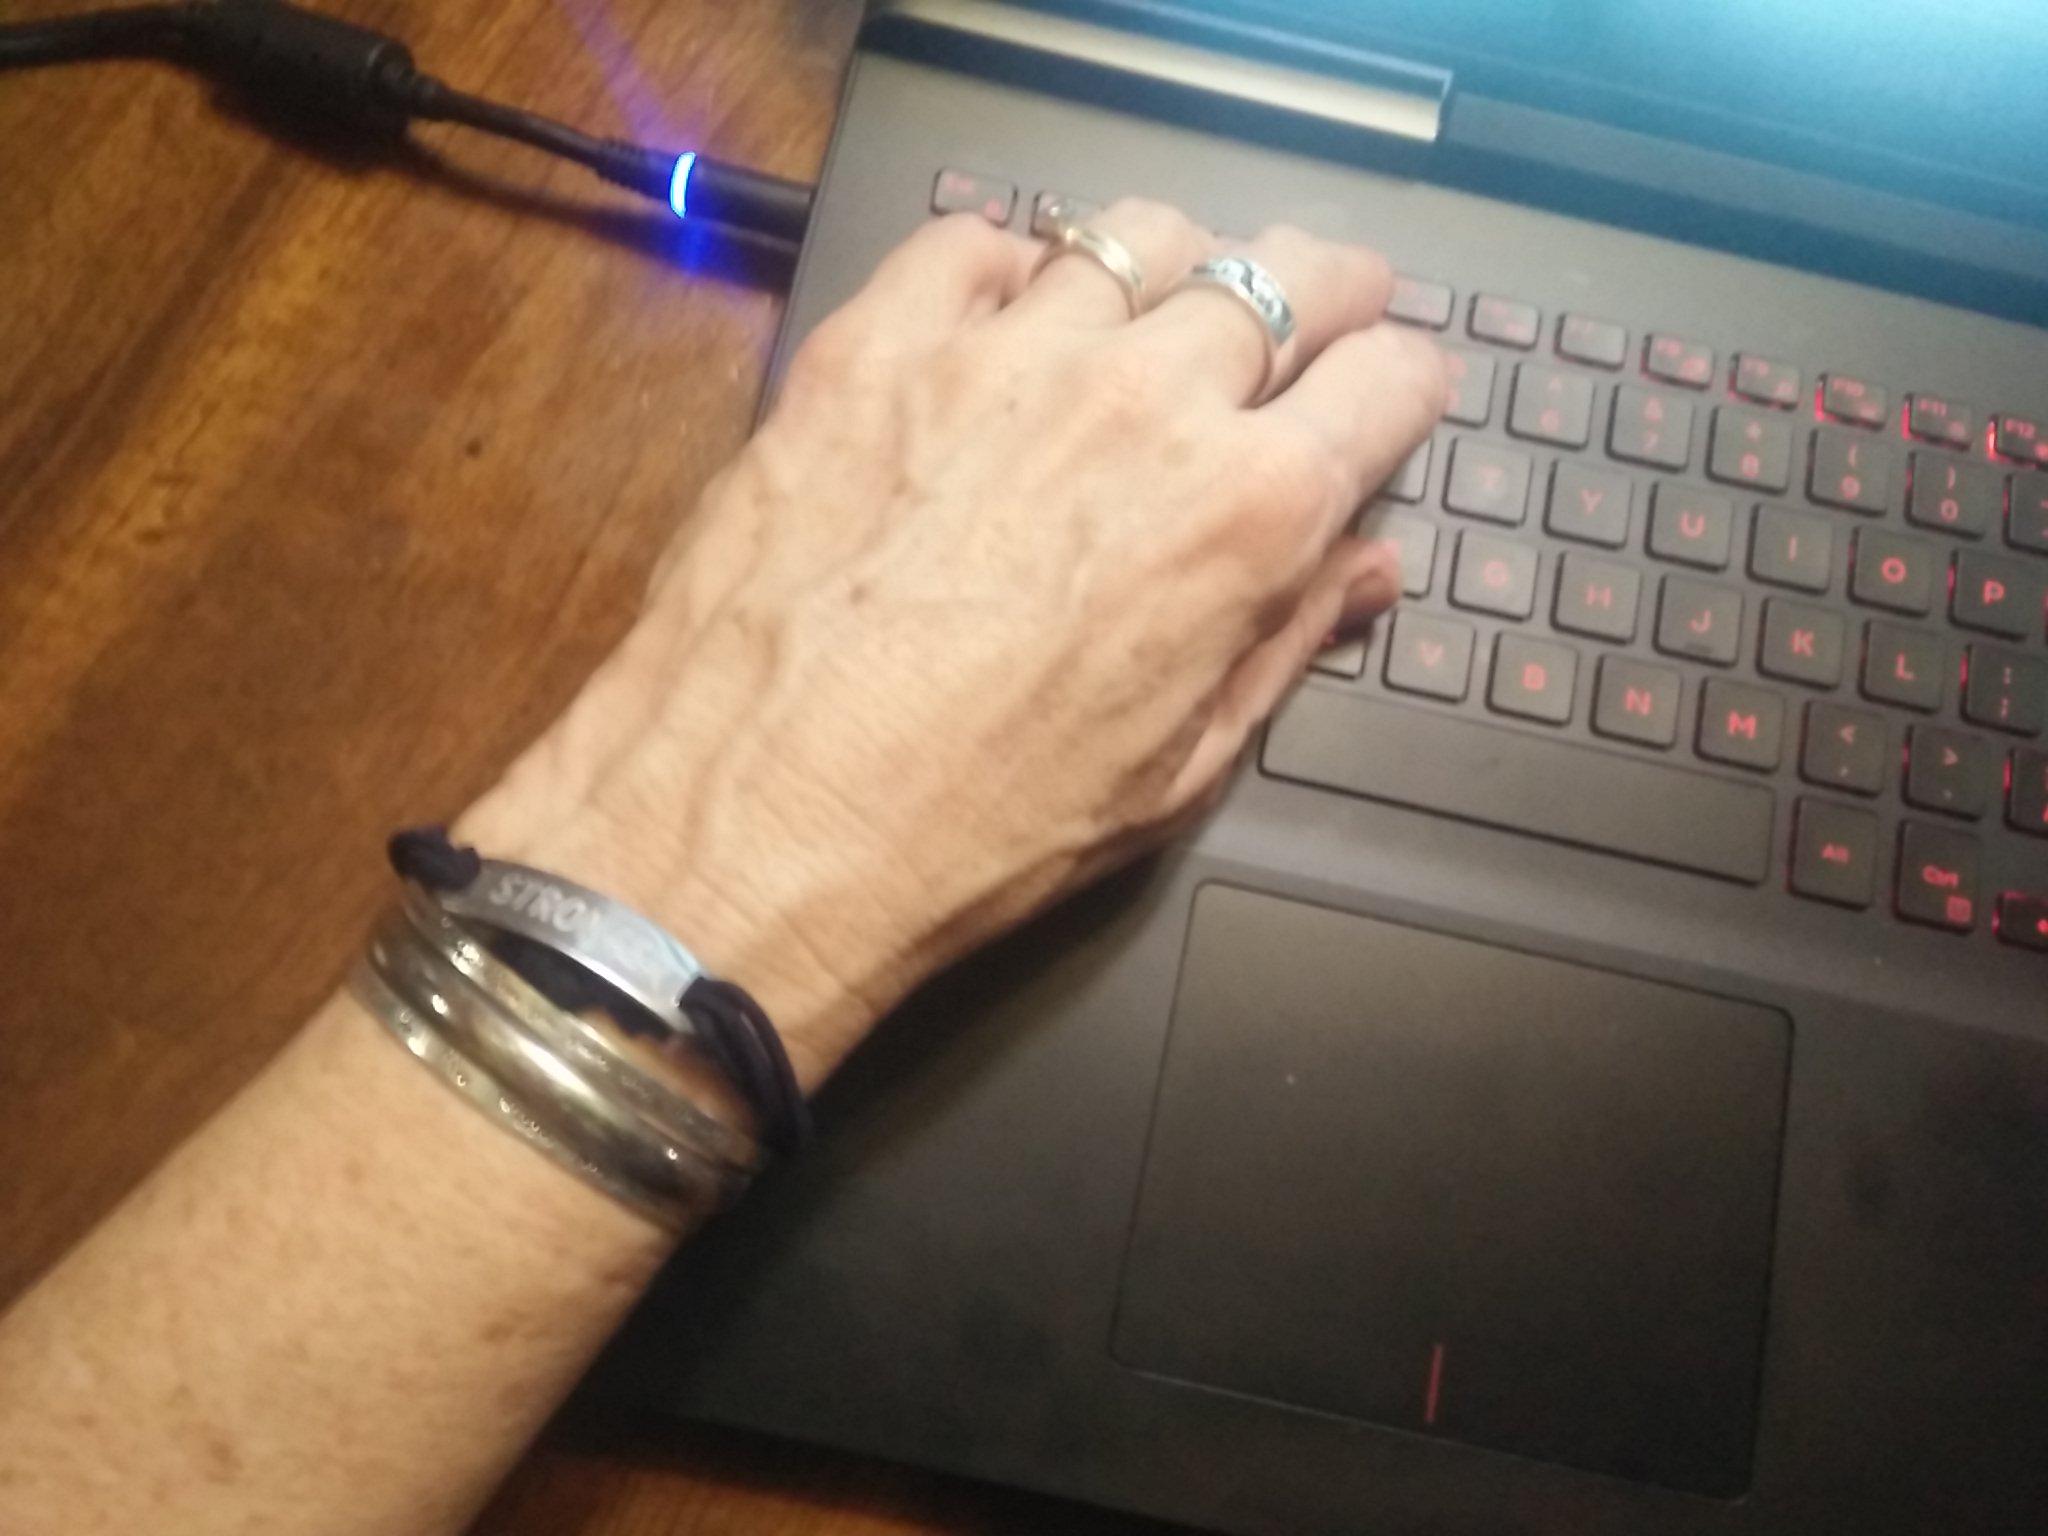 Elane's bracelets and rings